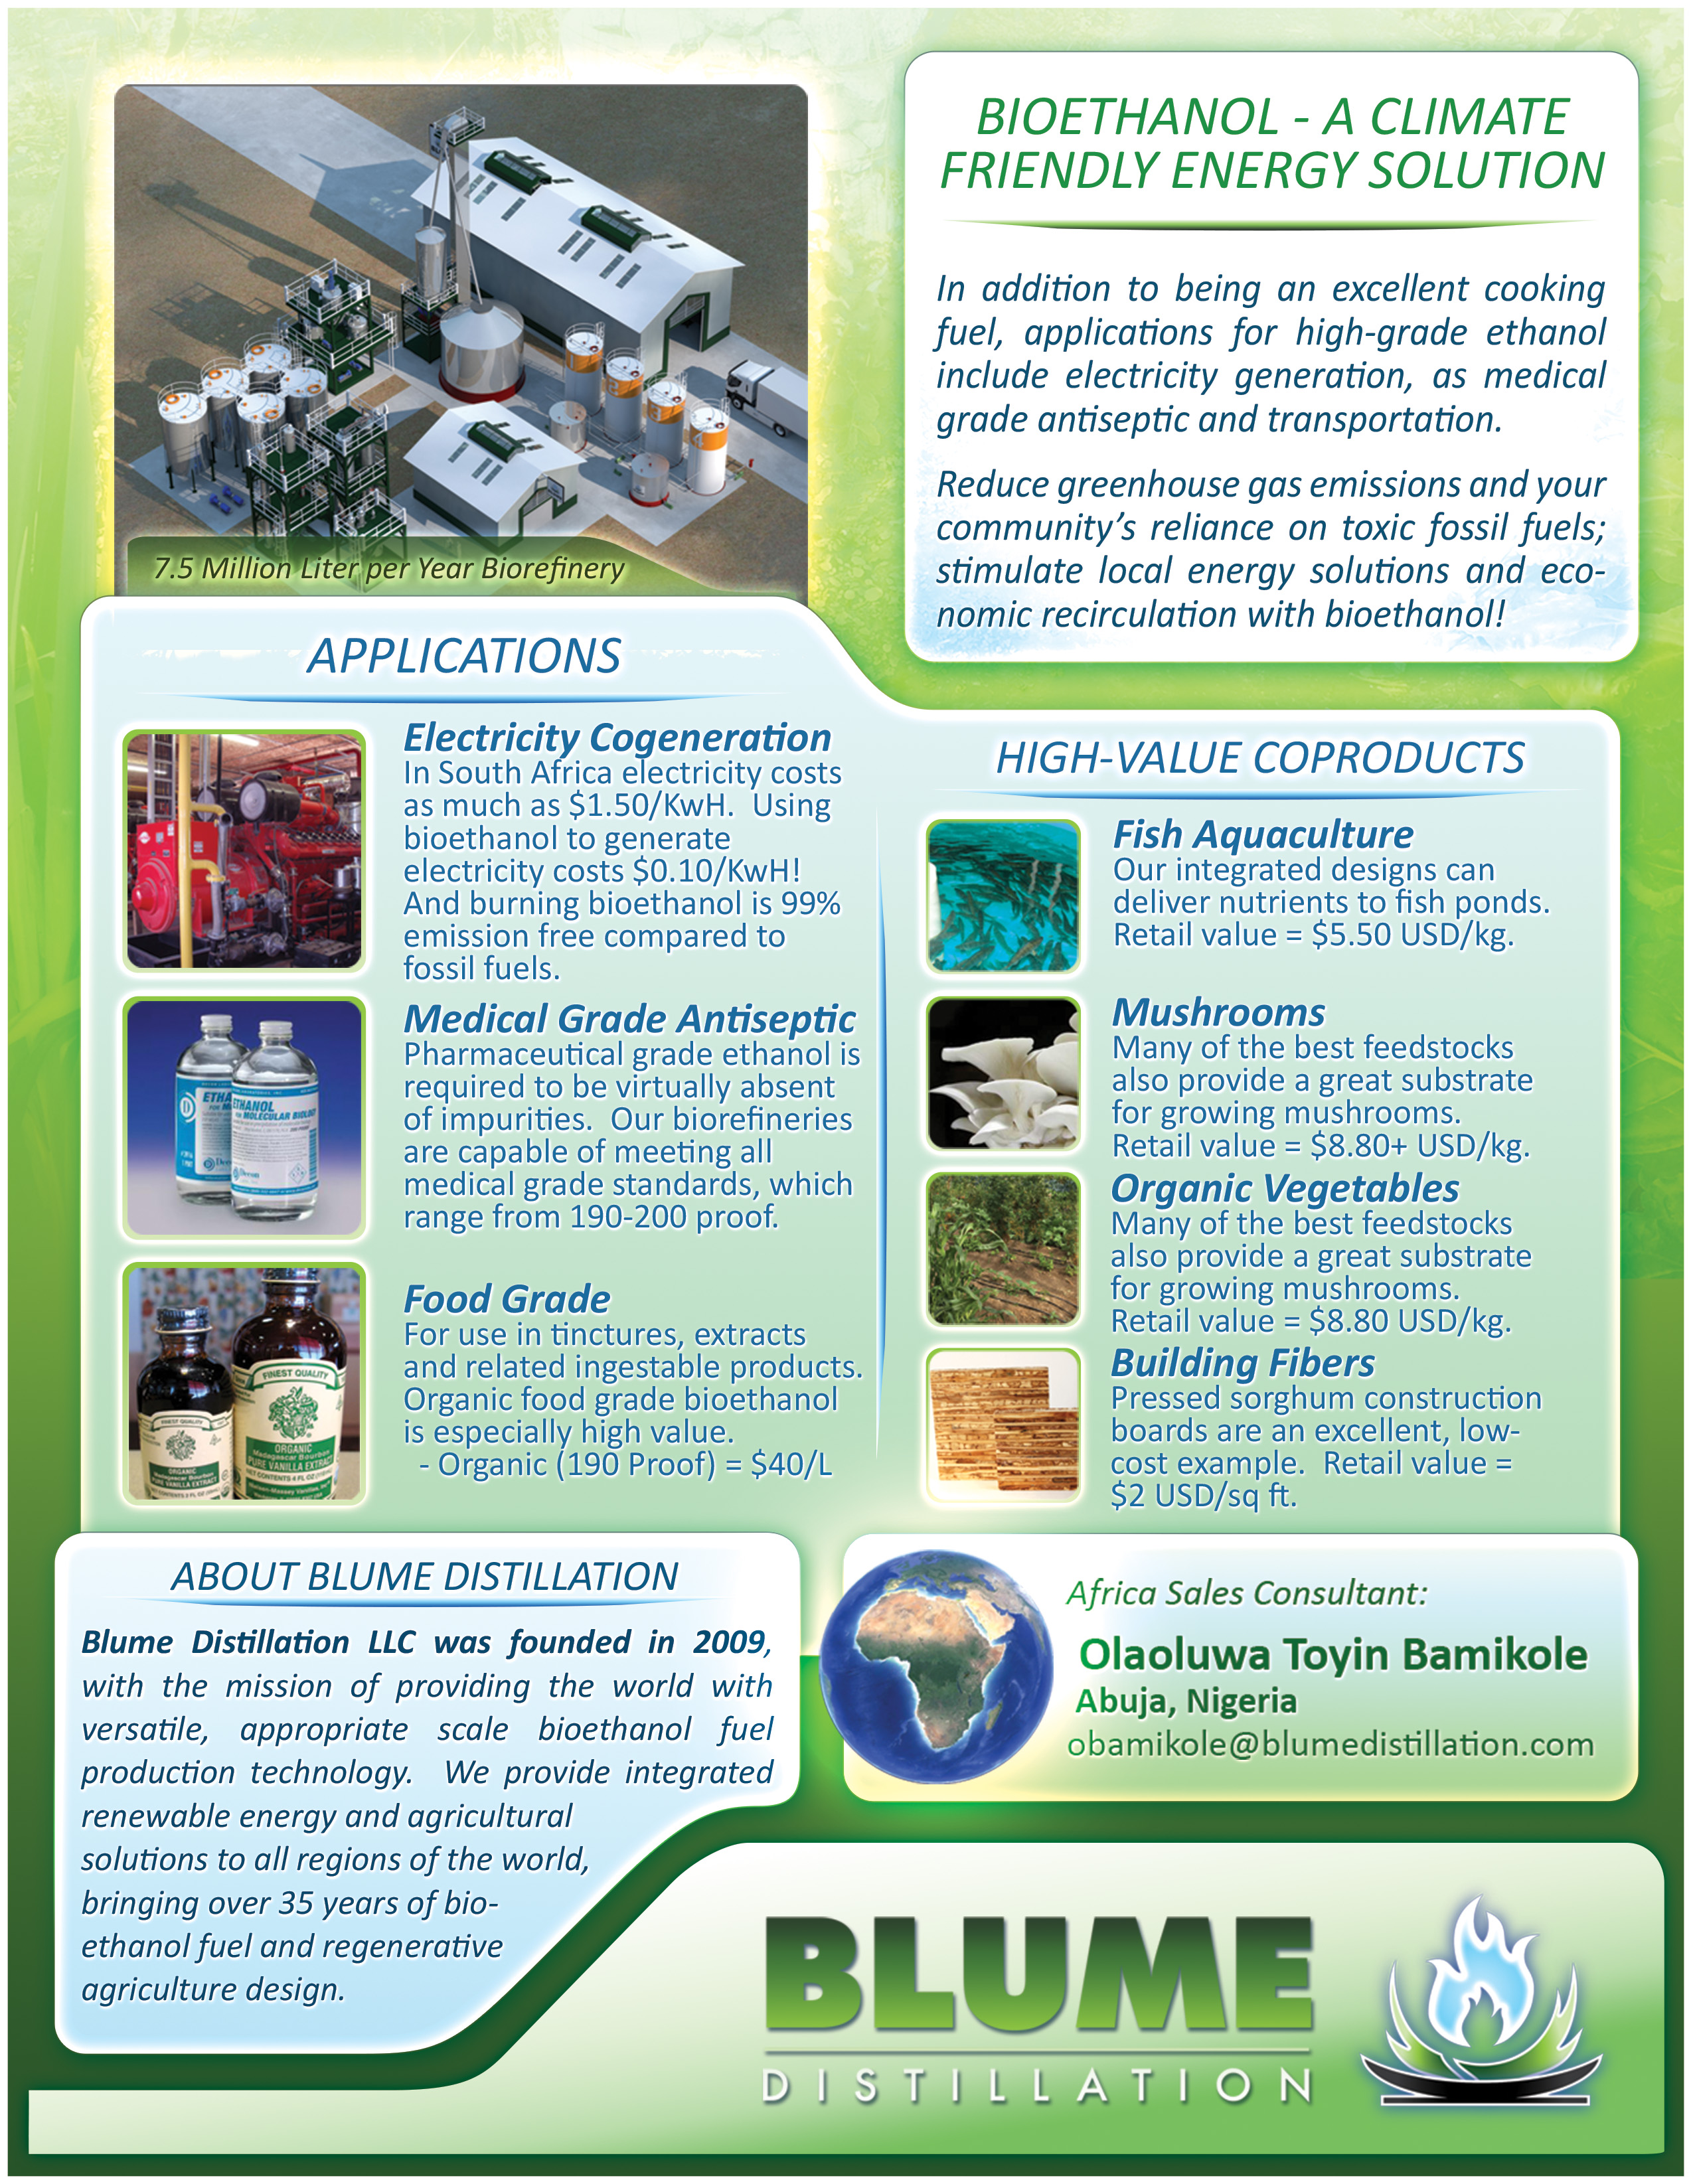 BLUME DISTILLATION – Advanced Biorefinery Systems